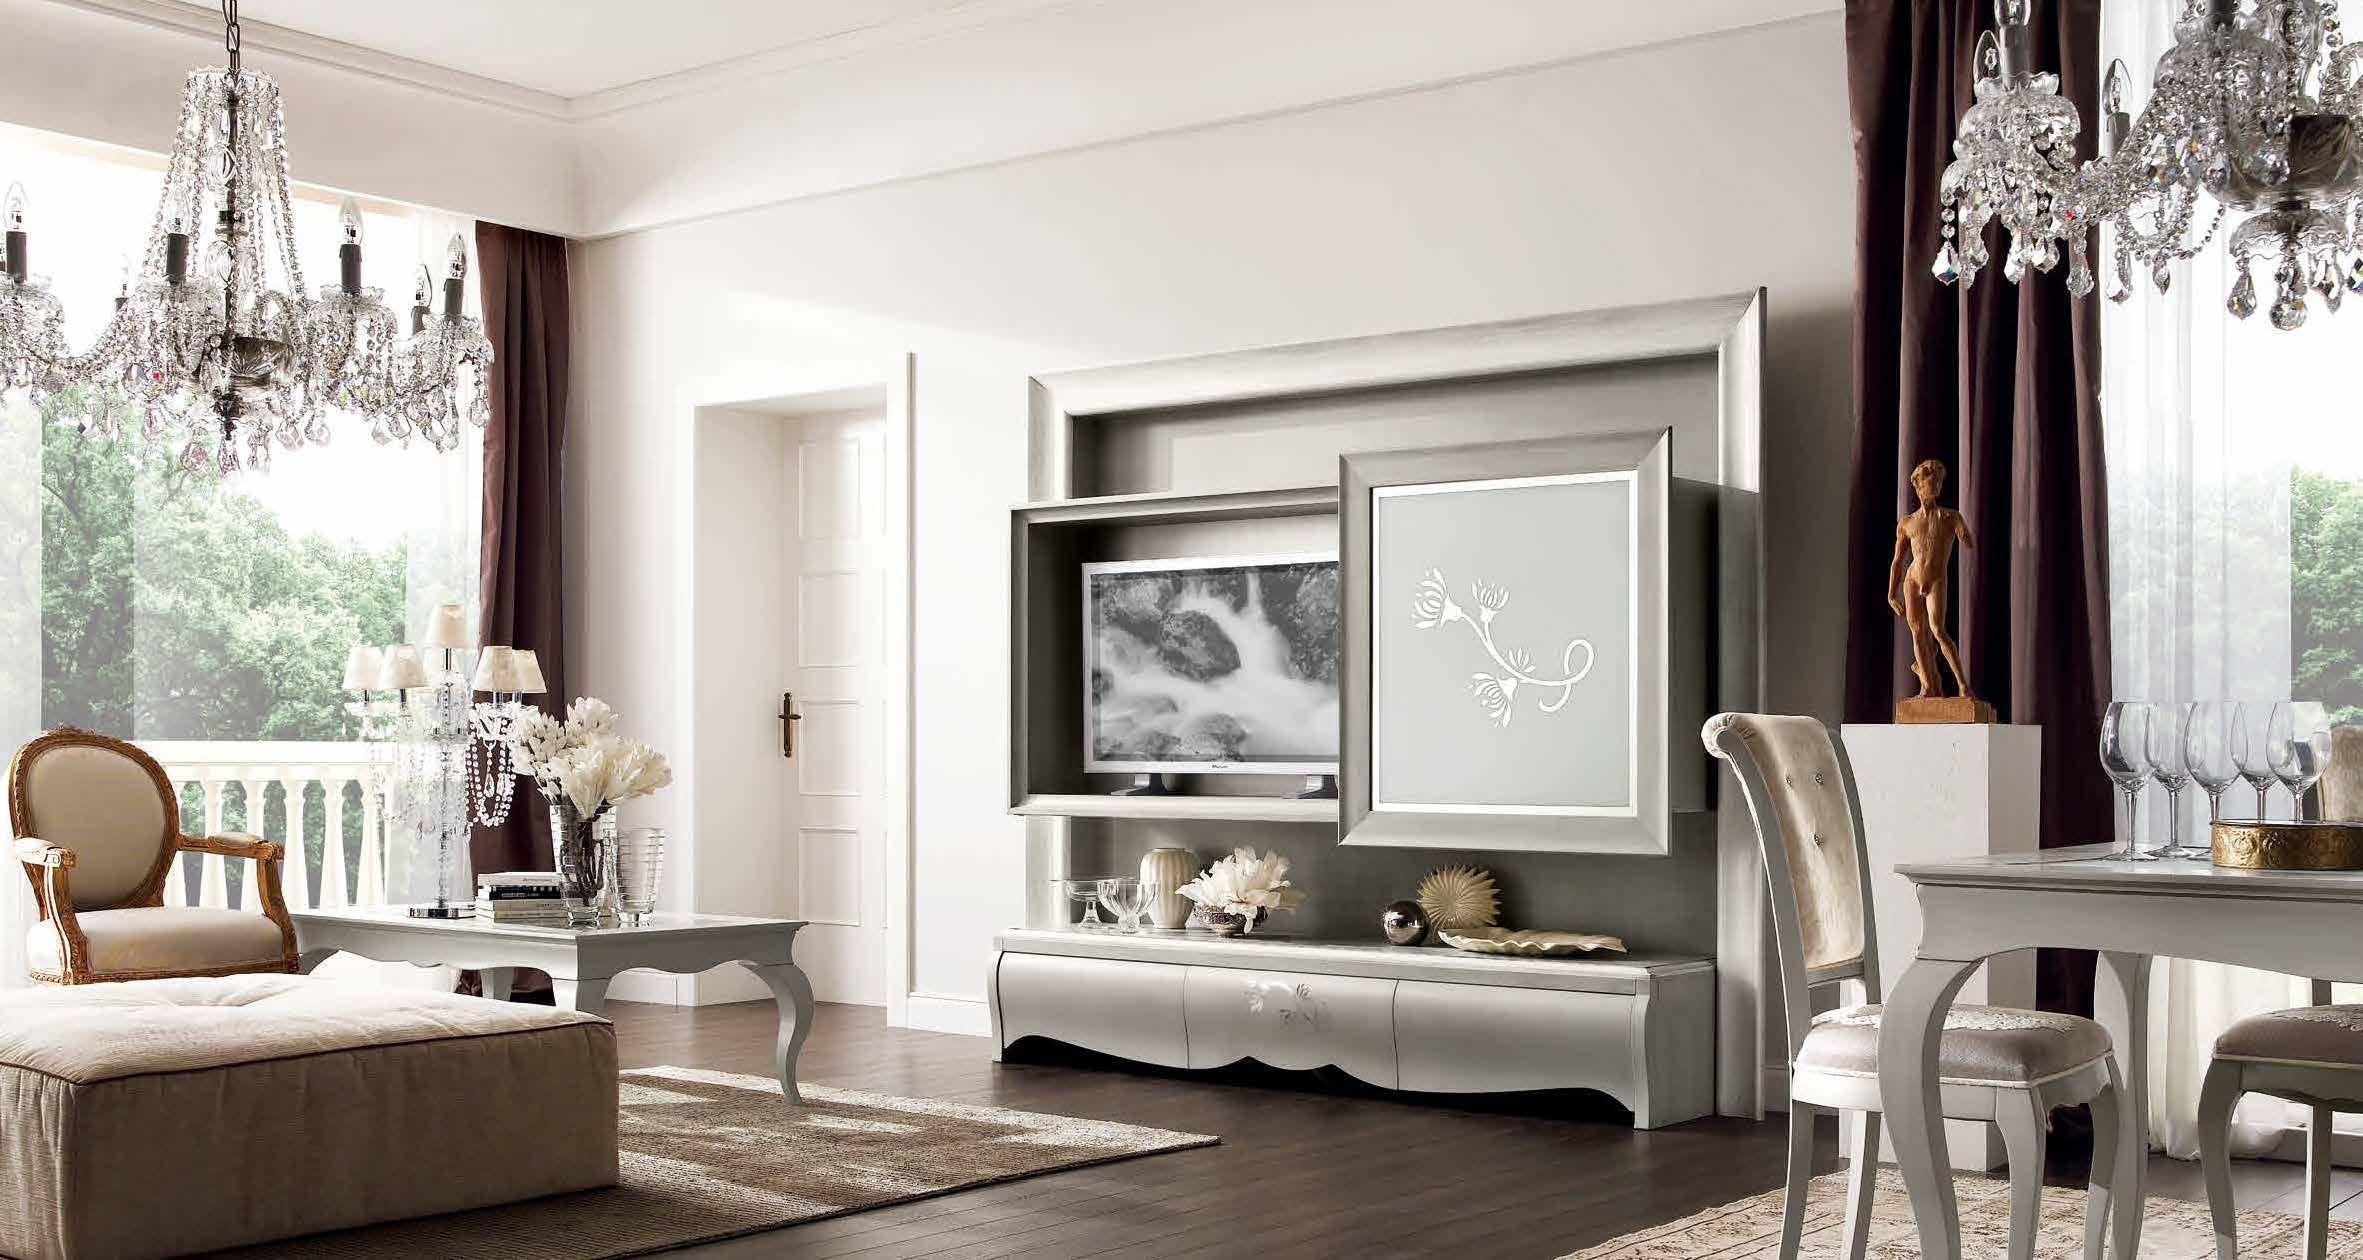 www.cordelsrl.com   #living room